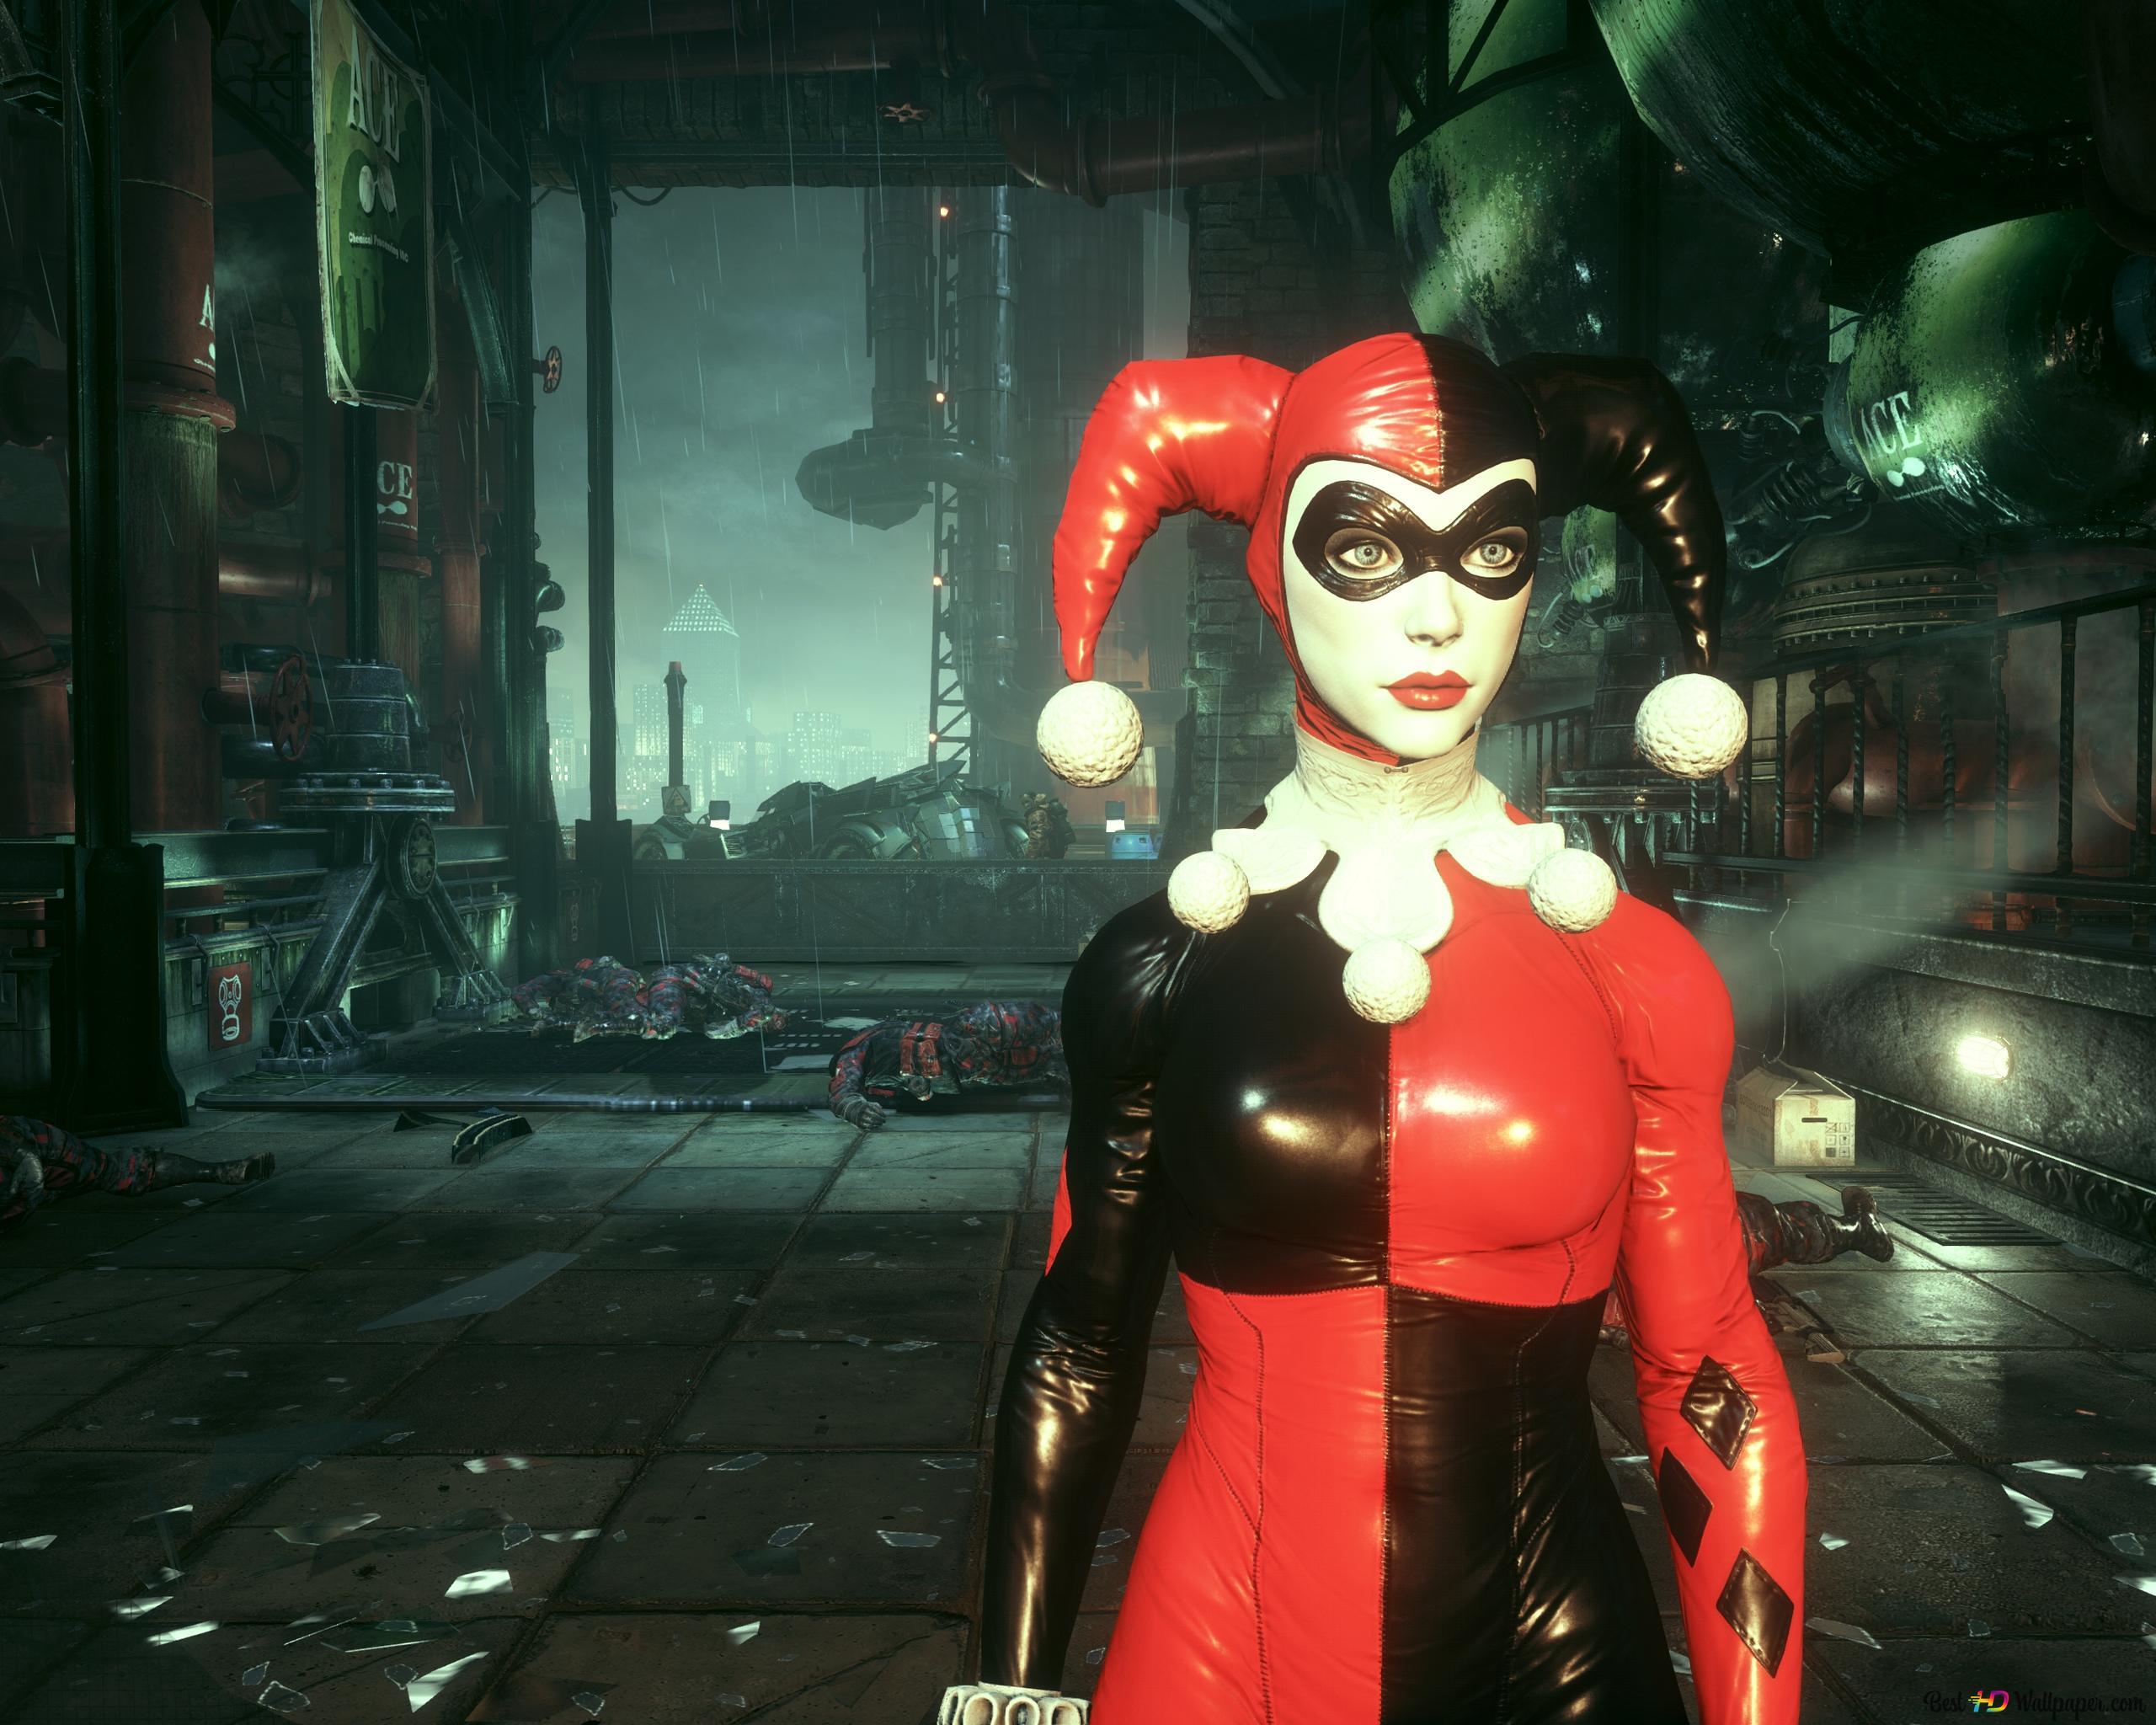 Joker Harley Quinn Hd Wallpaper Download